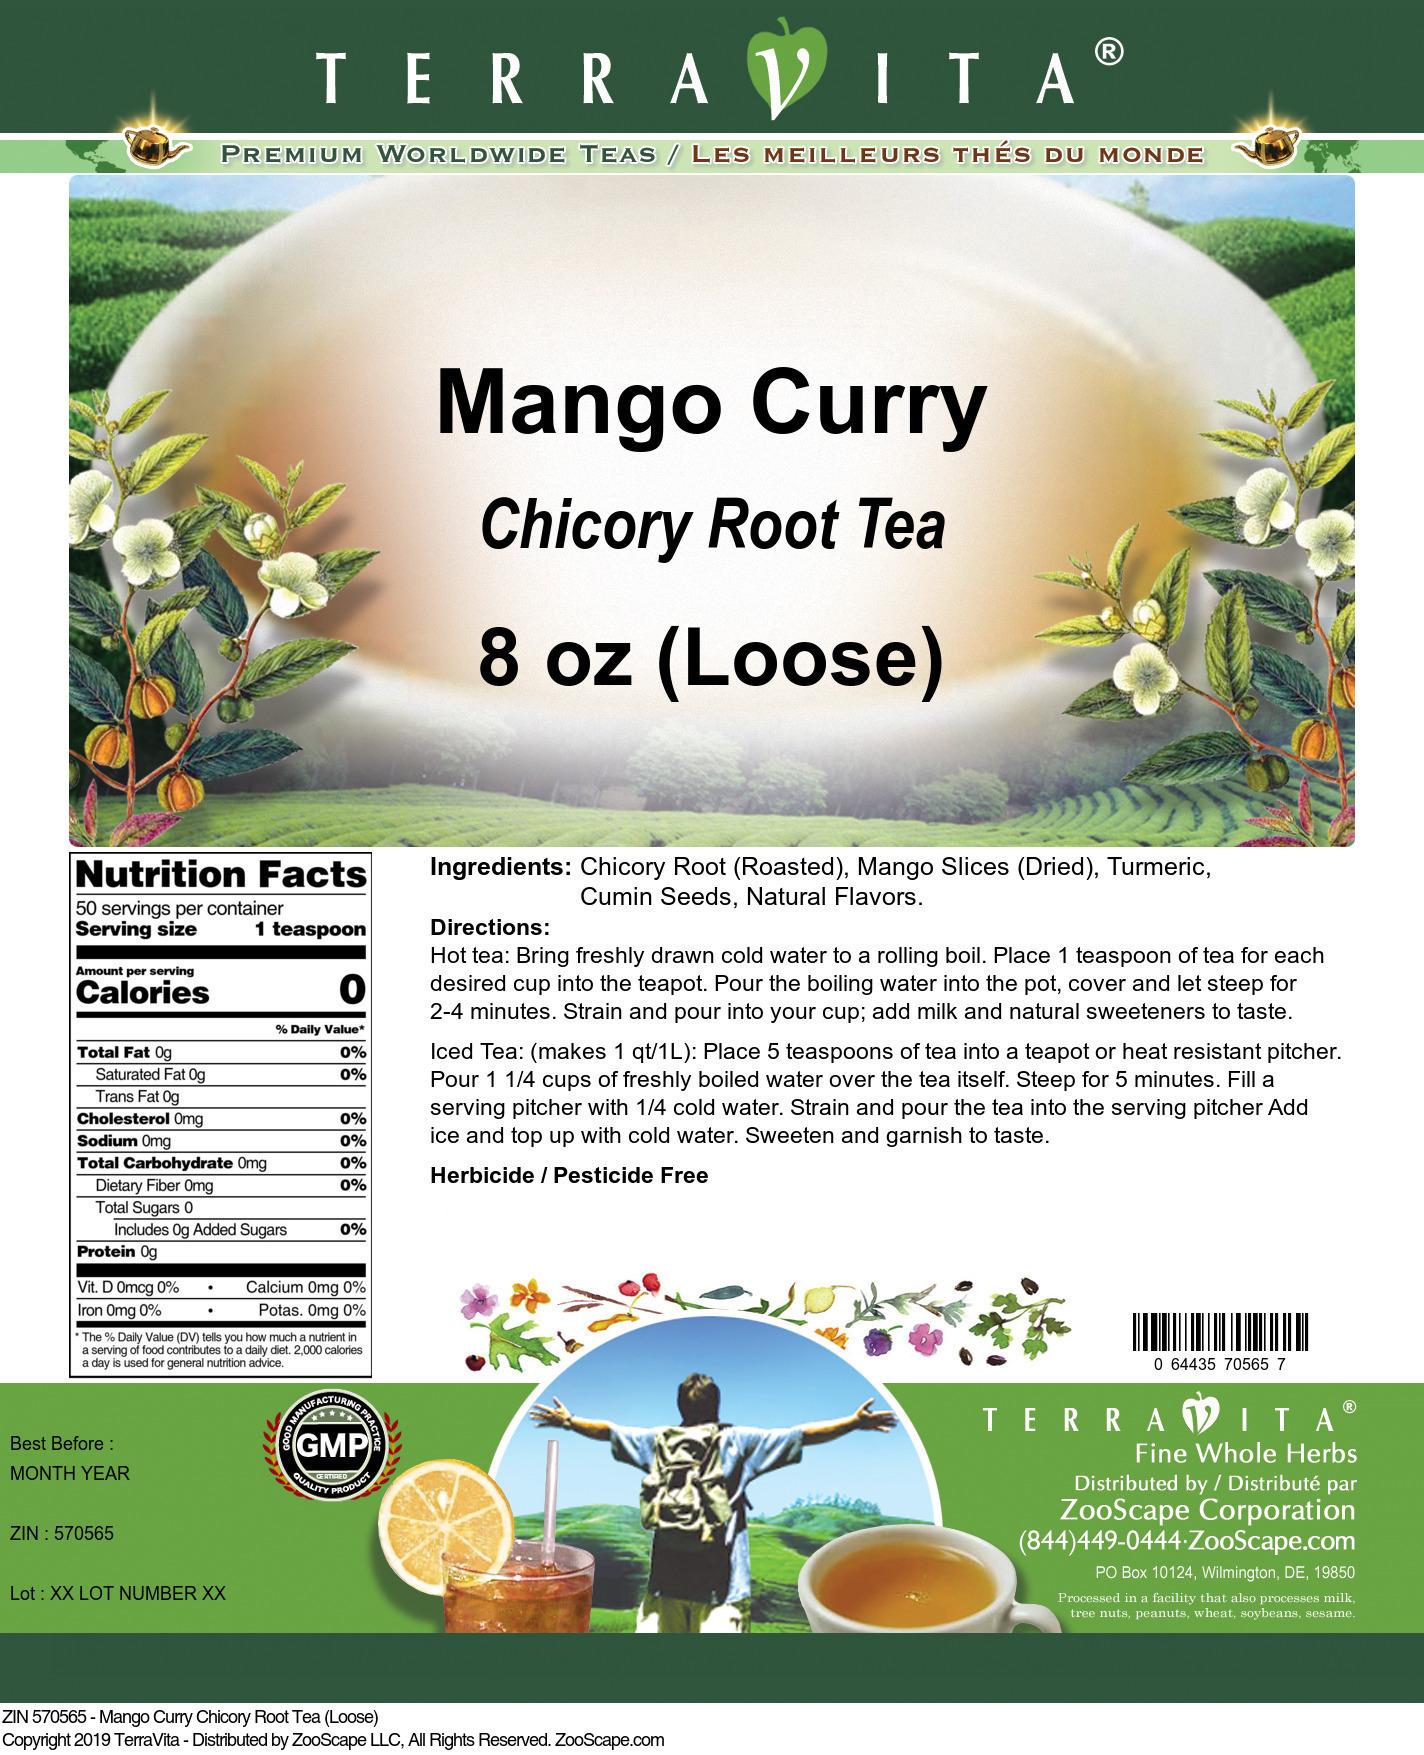 Mango Curry Chicory Root